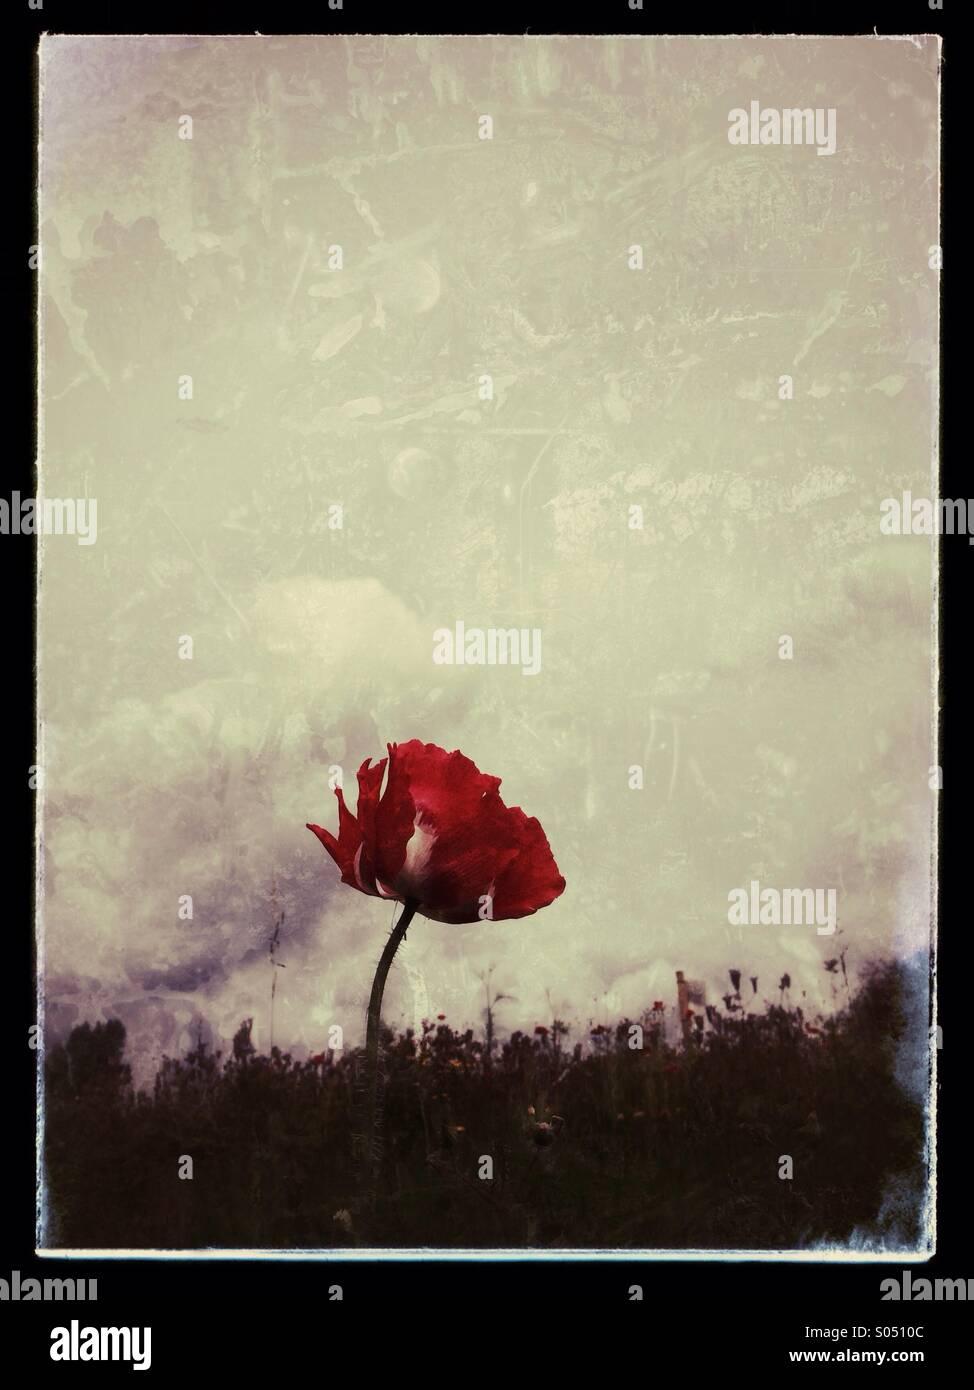 Red poppy - Stock Image